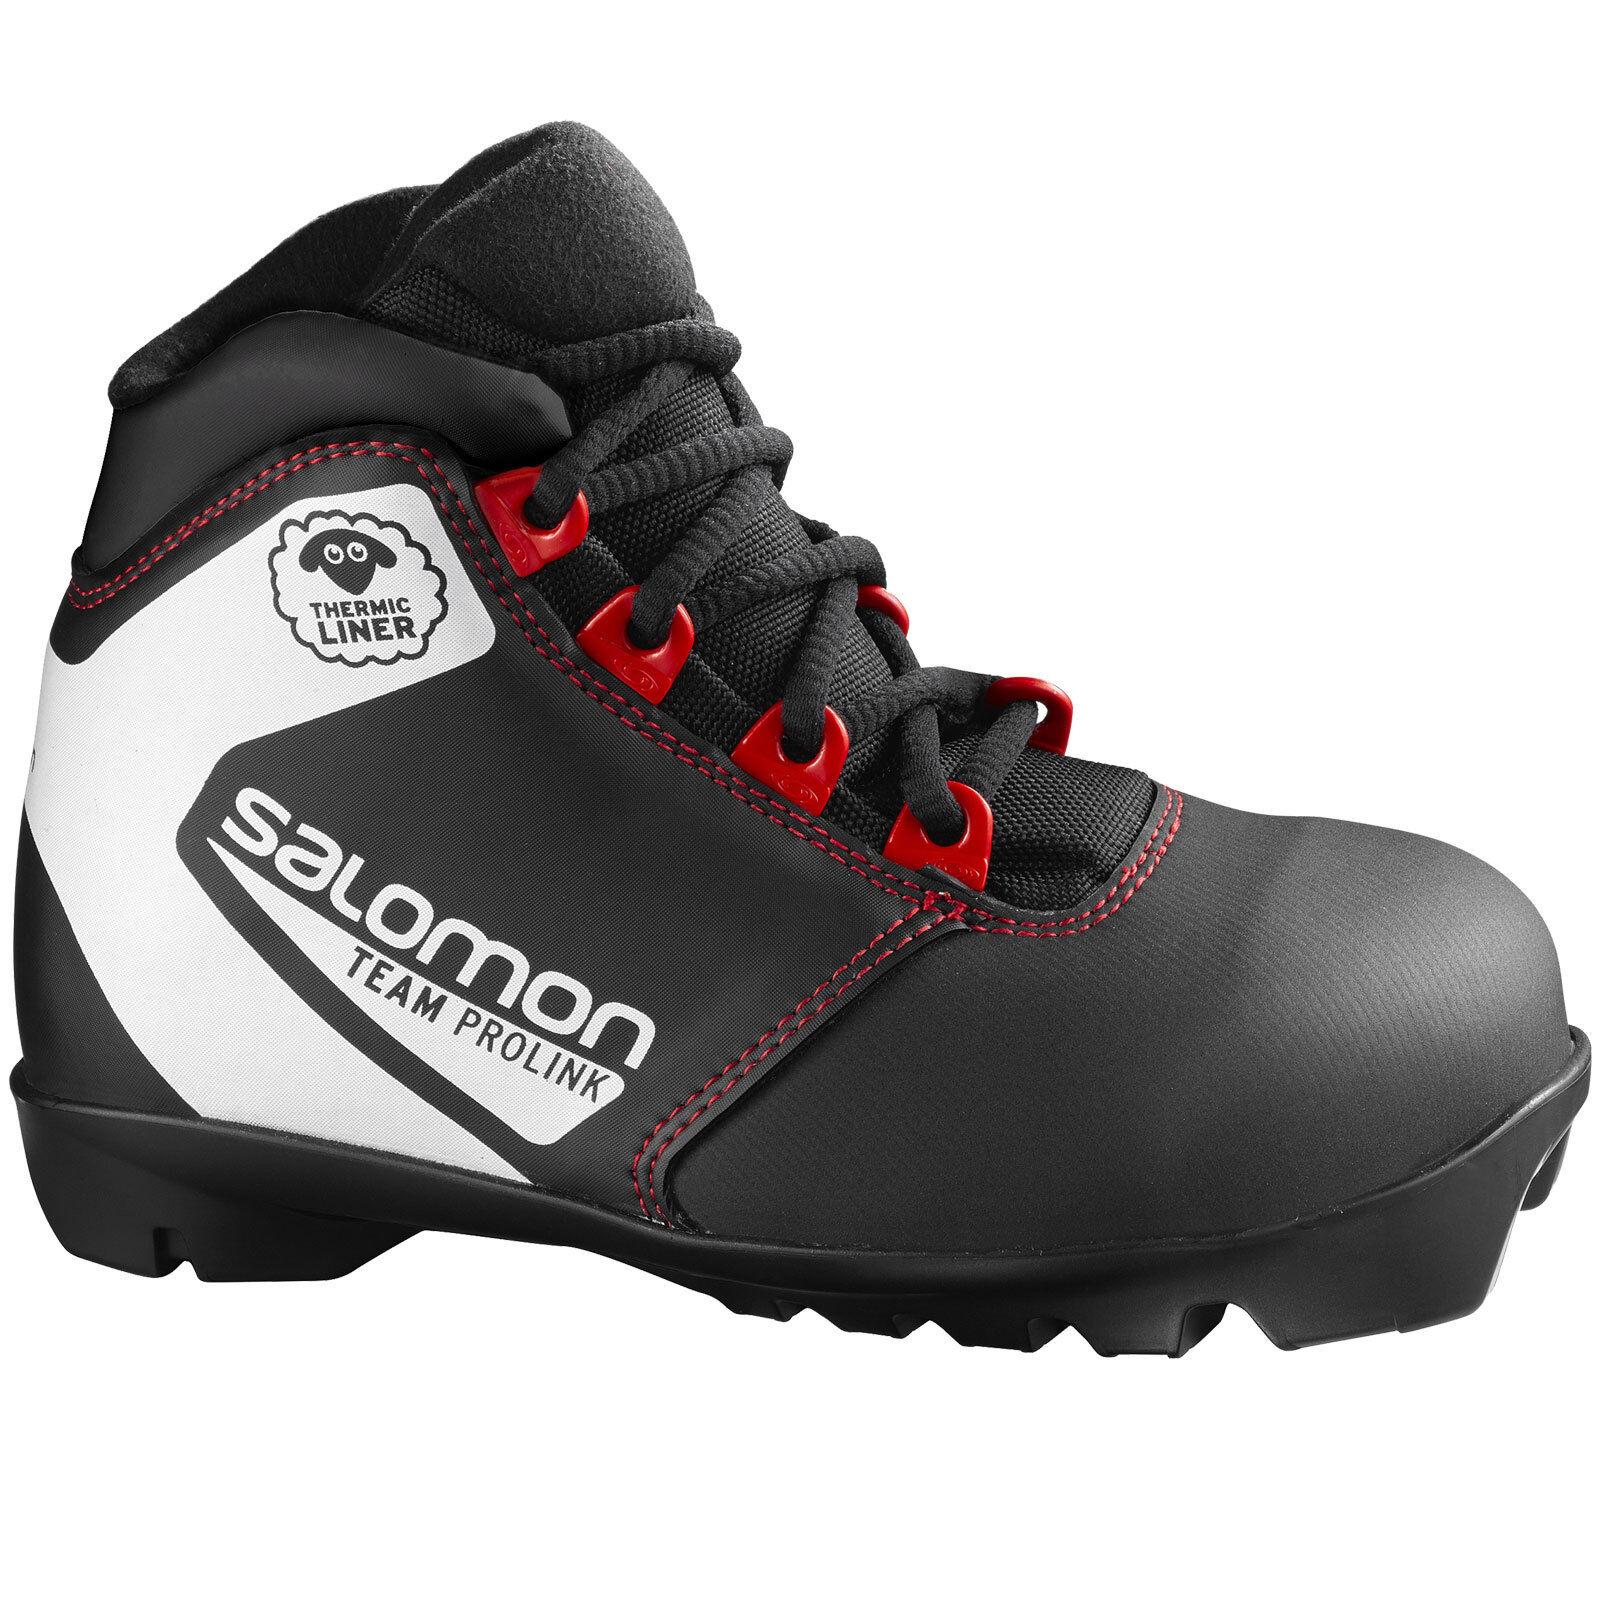 Salomon Team Prolink Jr Kinder-Langlaufschuhe NNN kompatibel Skischuhe Classic